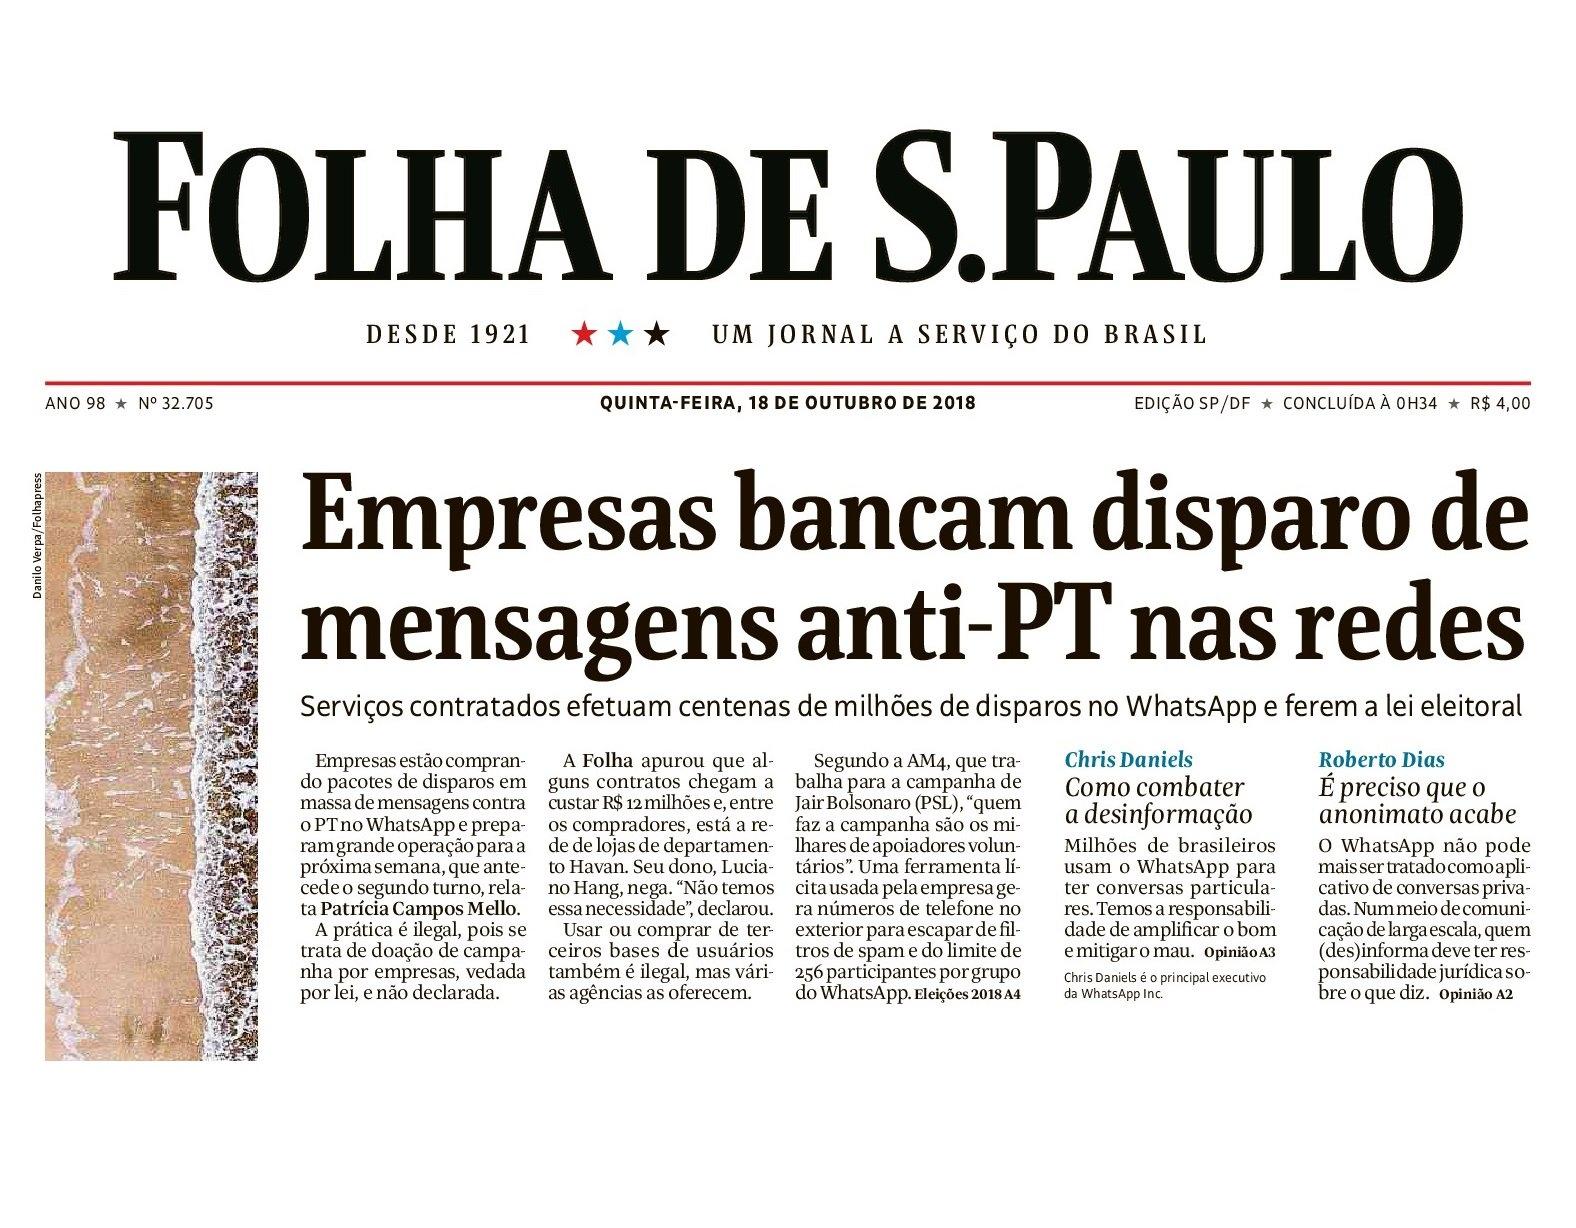 Segundo a Folha, a jornalista teve sua conta no WhatsApp invadida